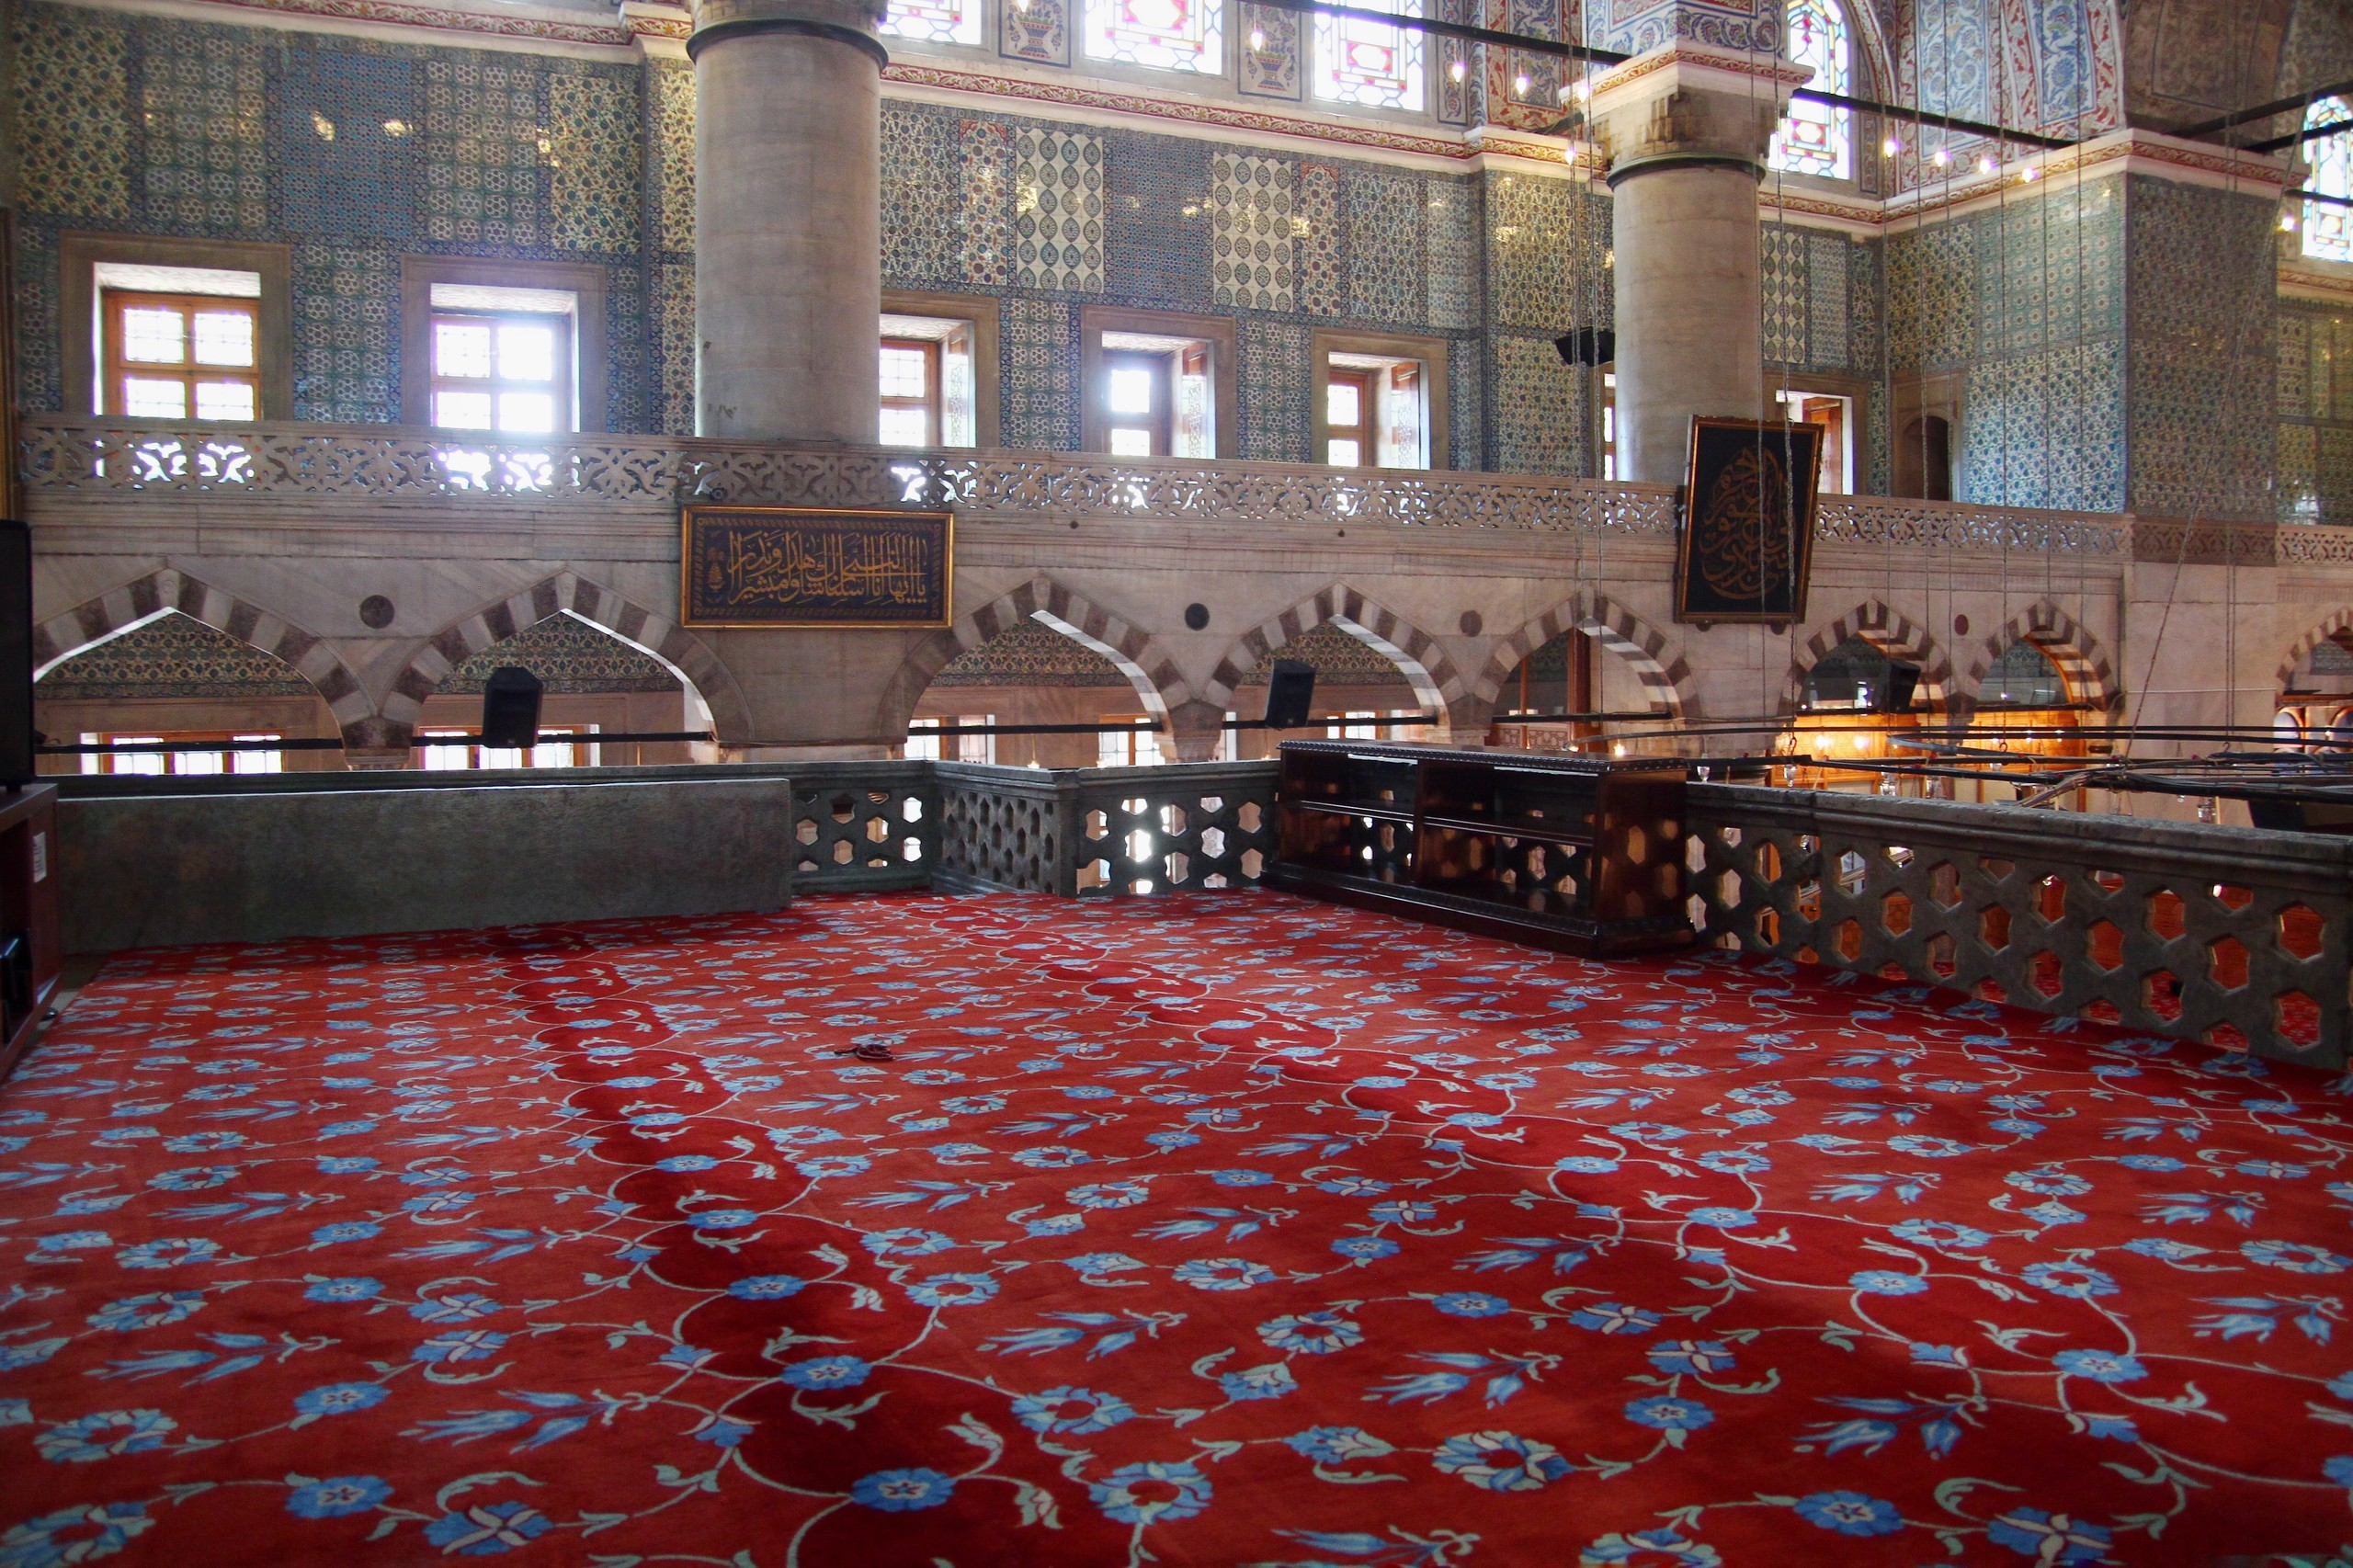 Pırlantadan Kubbeler #5: Sultanahmed - v4A2Wv - Pırlantadan Kubbeler #5: Sultanahmed